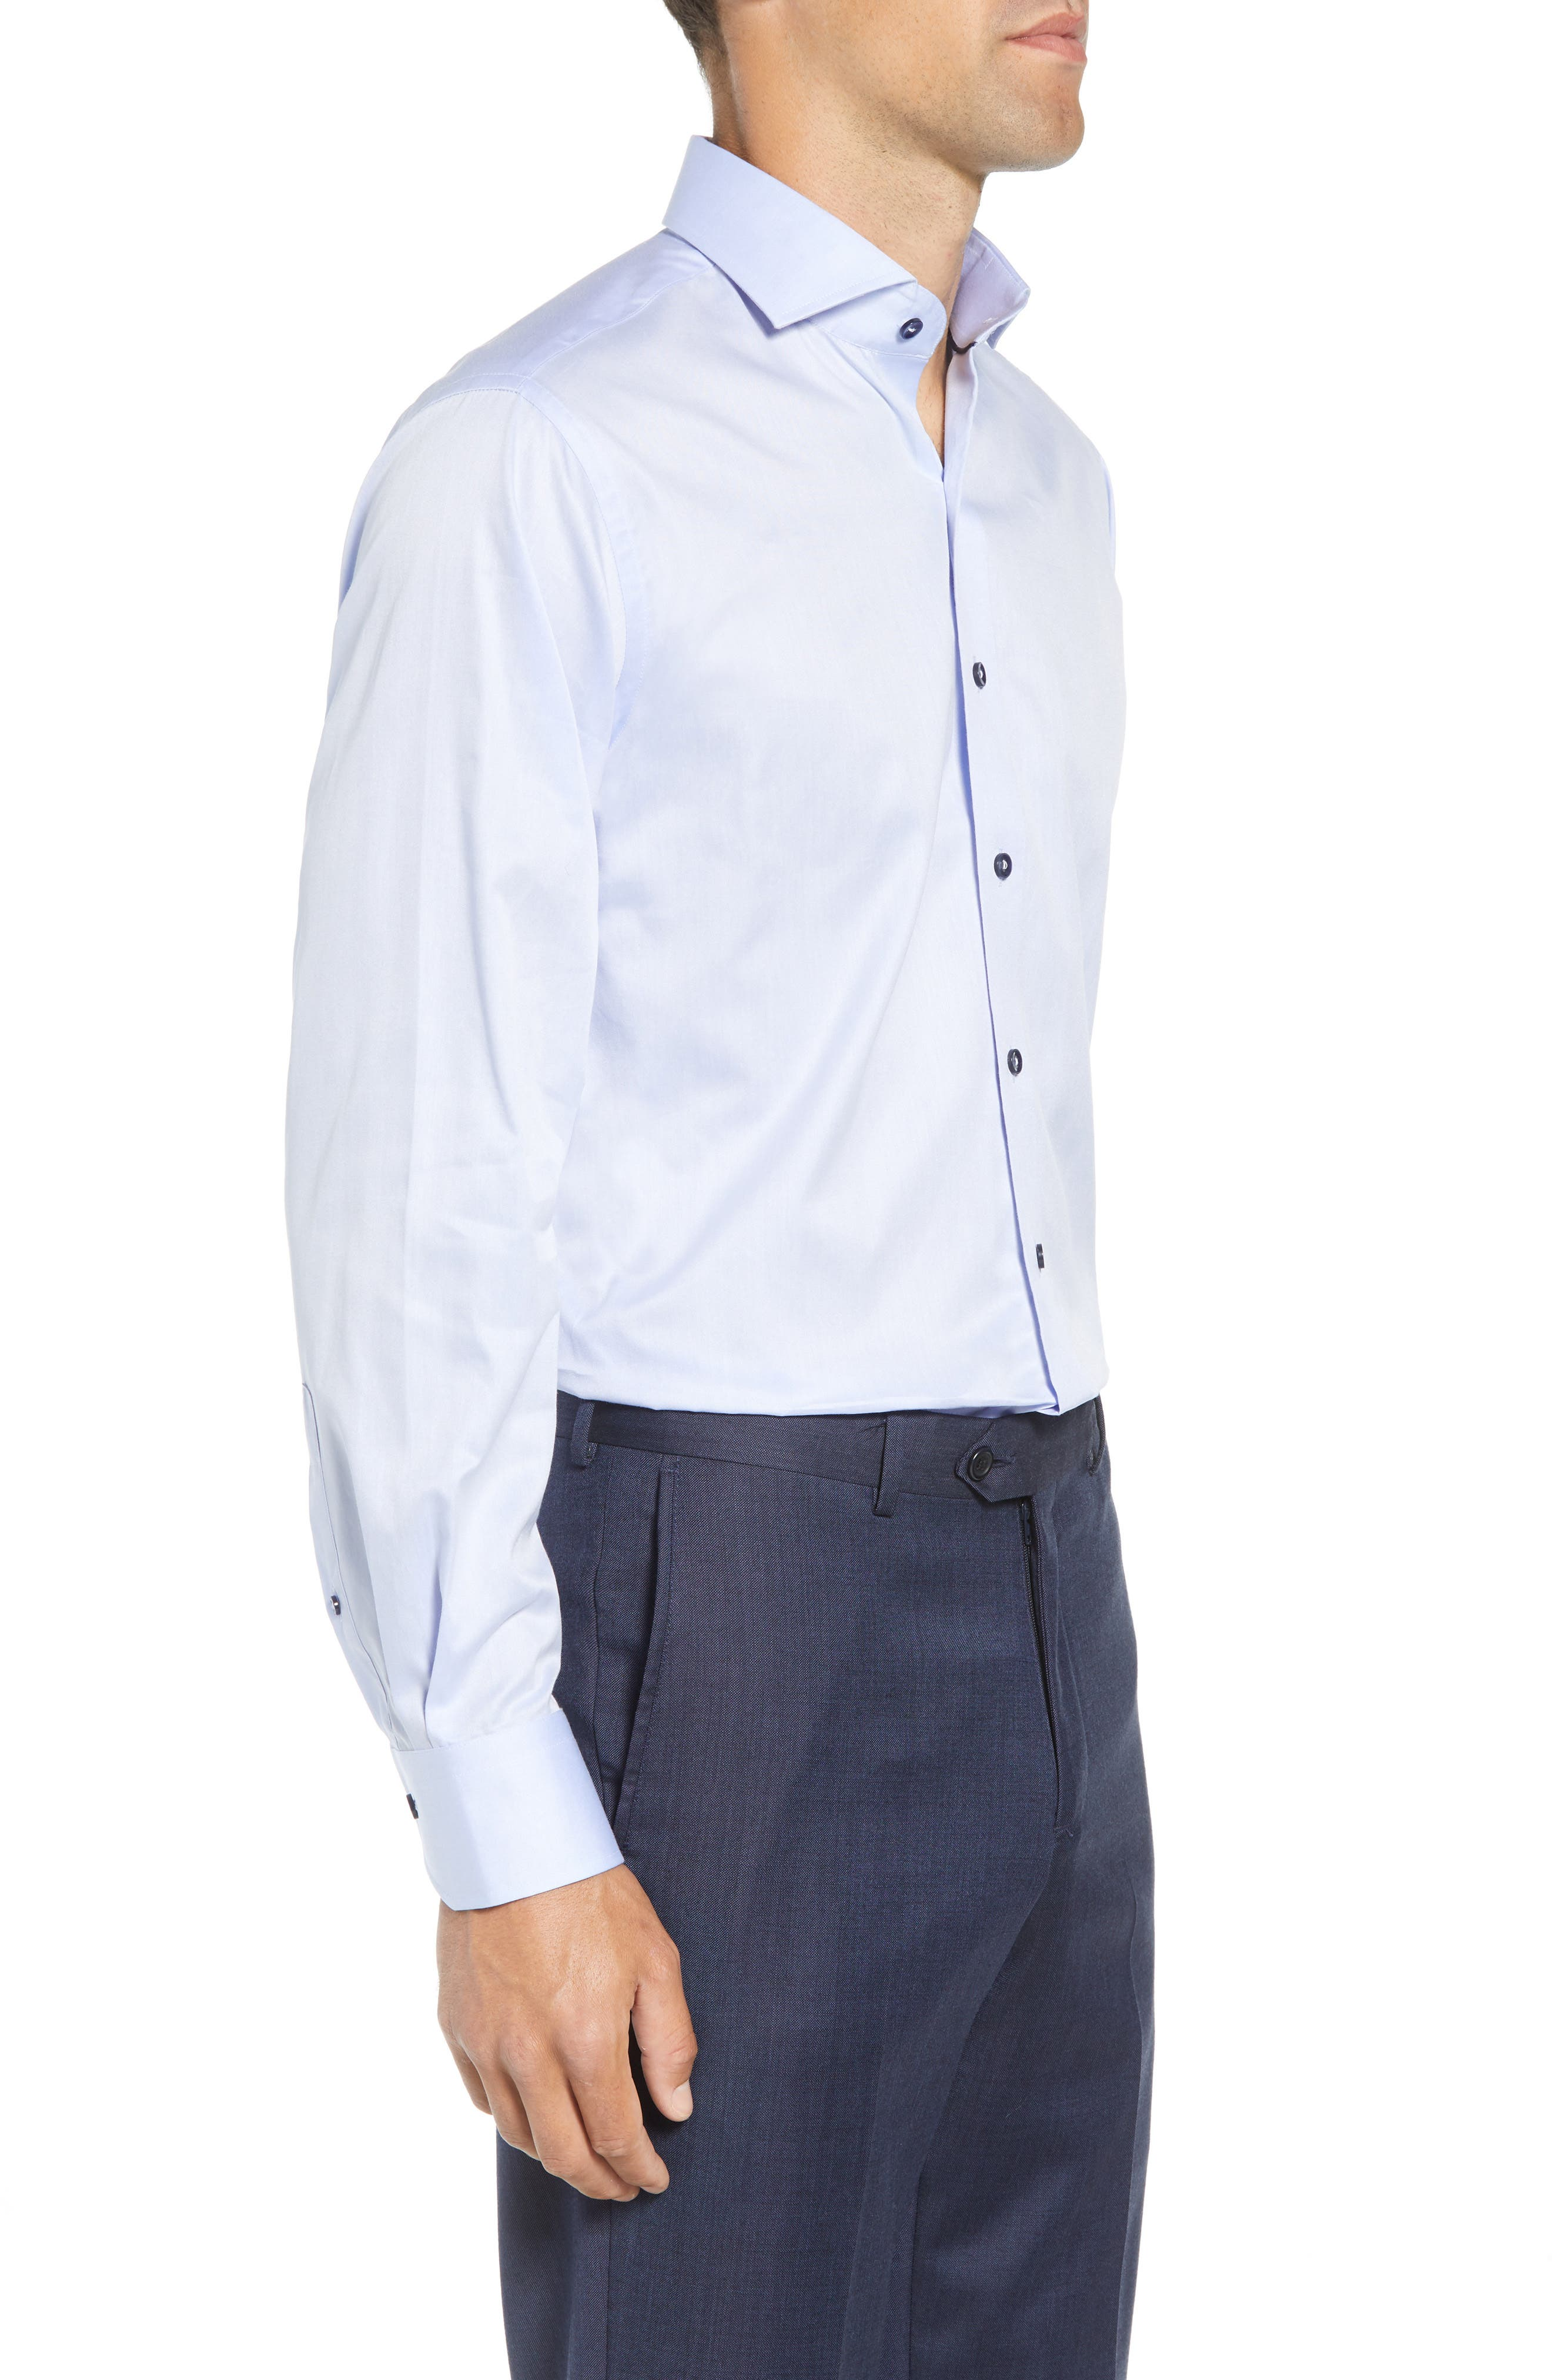 LORENZO UOMO,                             Trim Fit Solid Dress Shirt,                             Alternate thumbnail 4, color,                             LIGHT BLUE